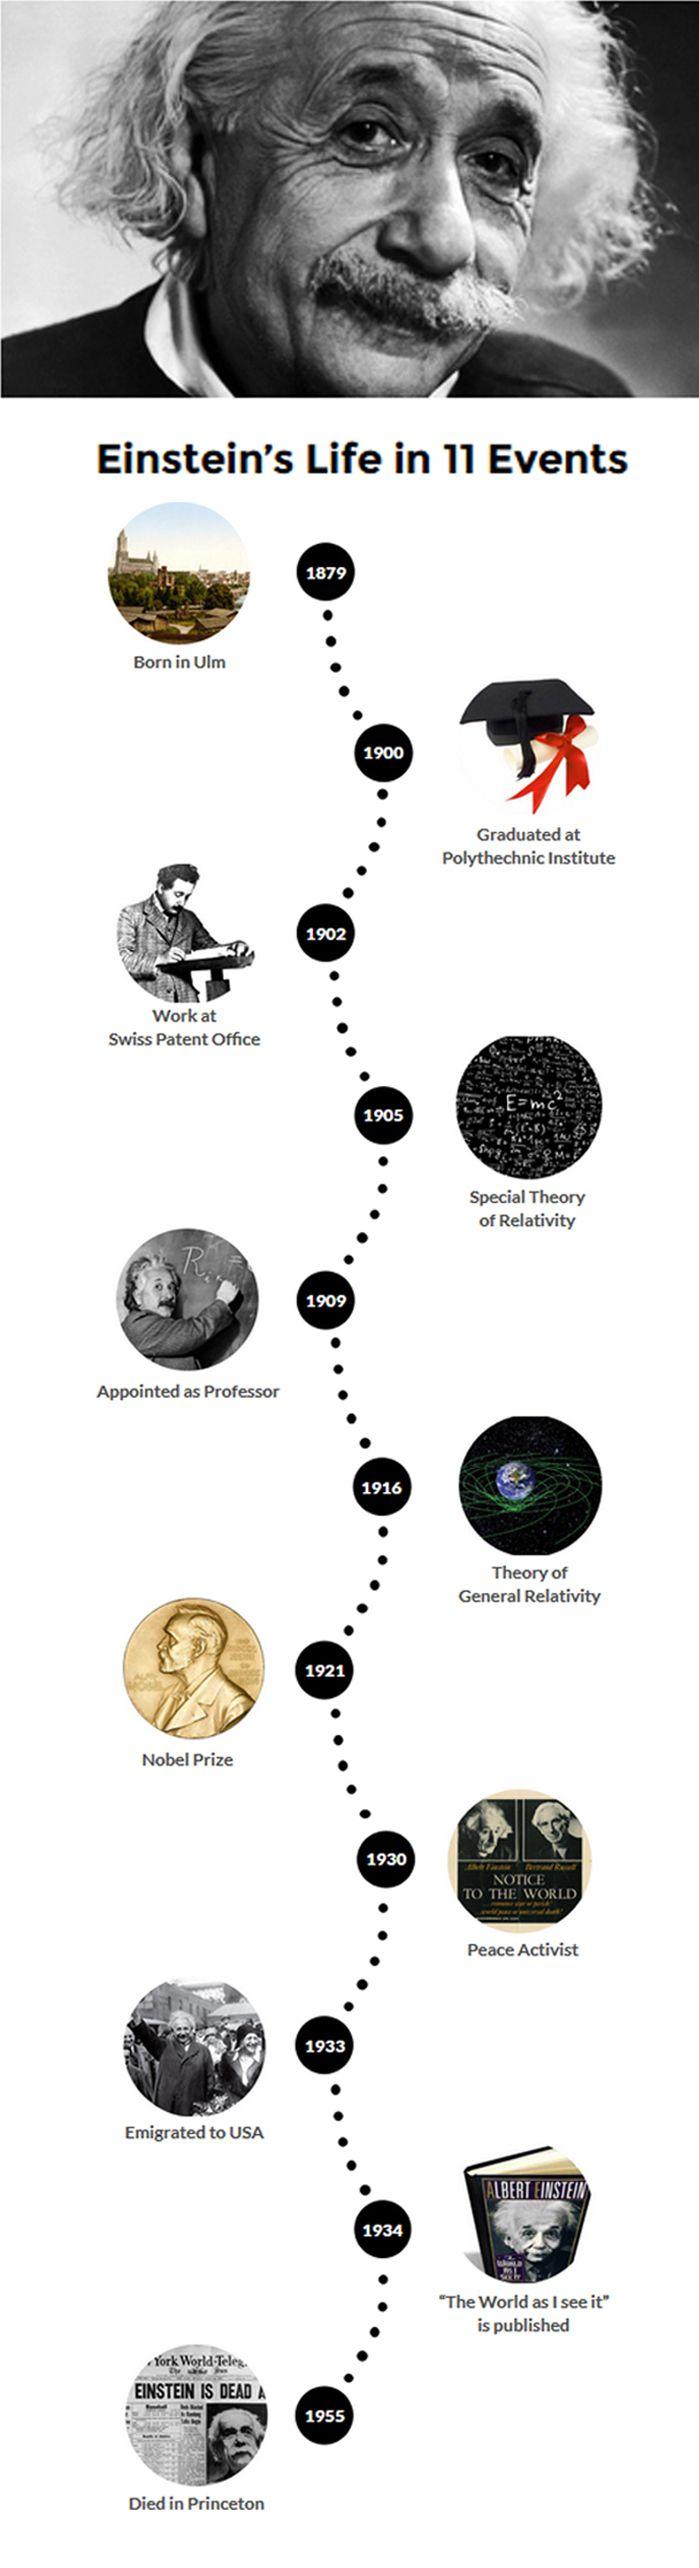 An Albert Einstein biography timeline: his life story told in 11 key events. #einstein #timeline #biography